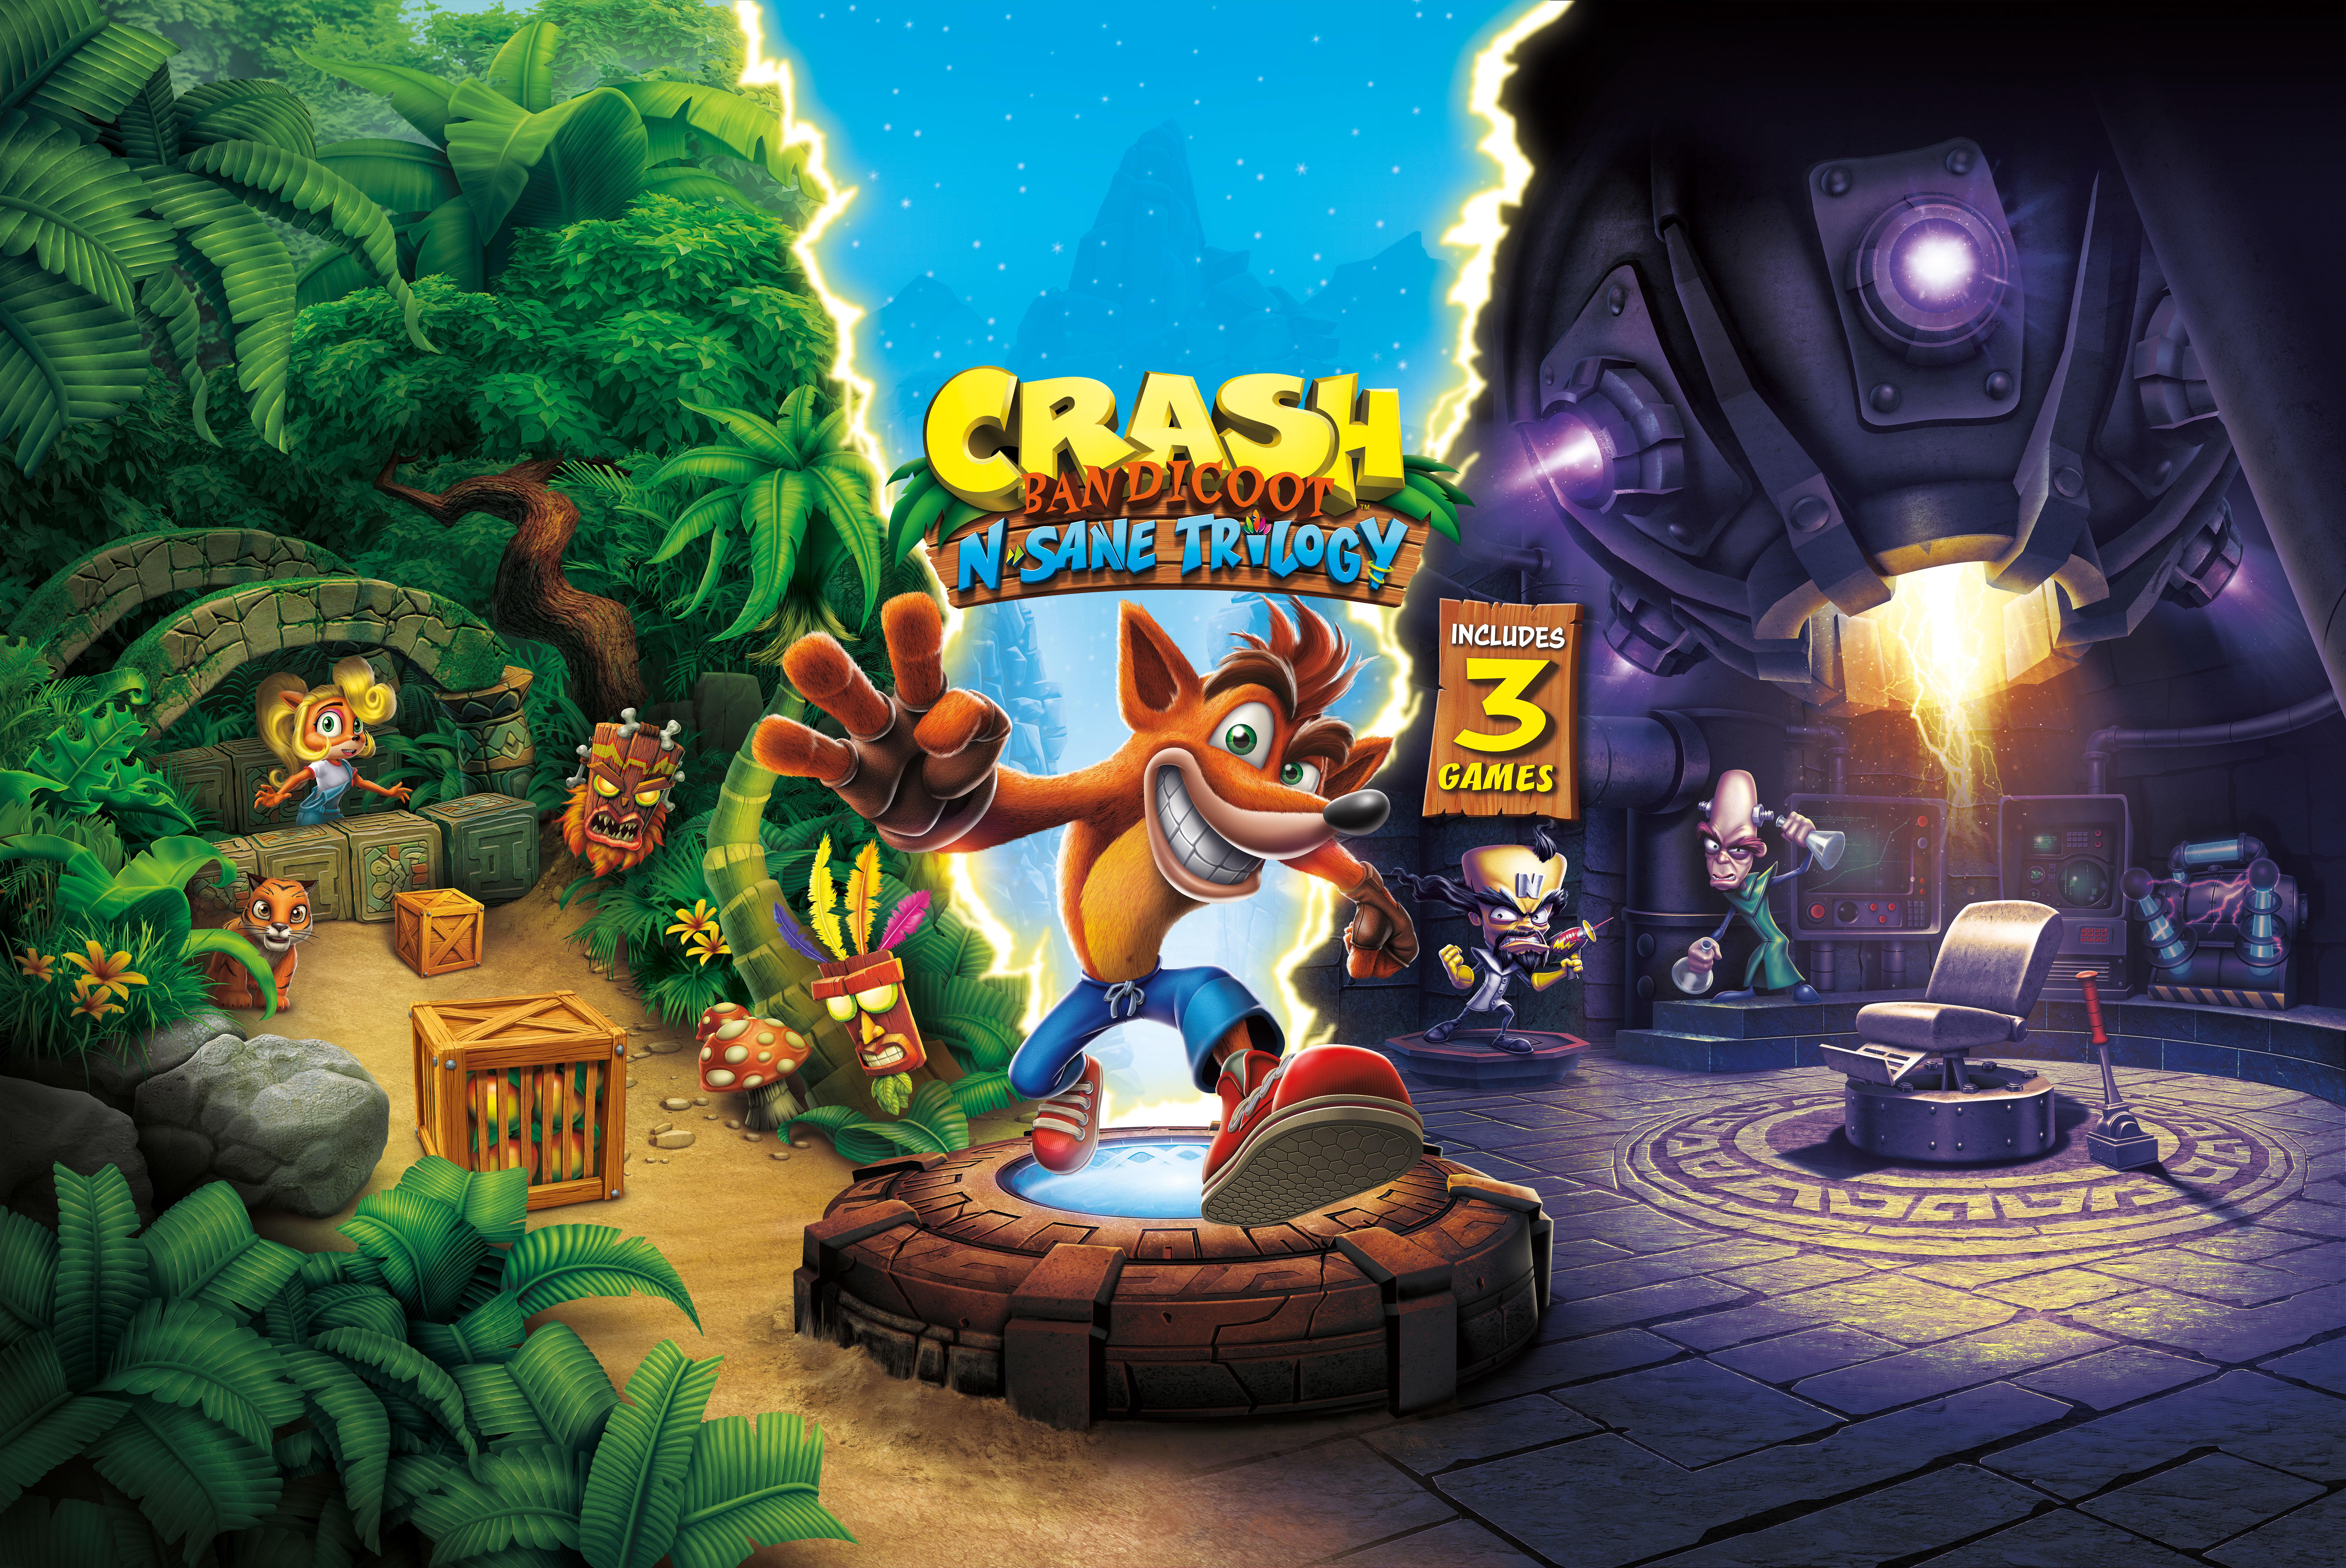 Crash Bandicoot N. Sane Trilogy - Crash Bandicoot N. Sane Trilogy 9K, Арт